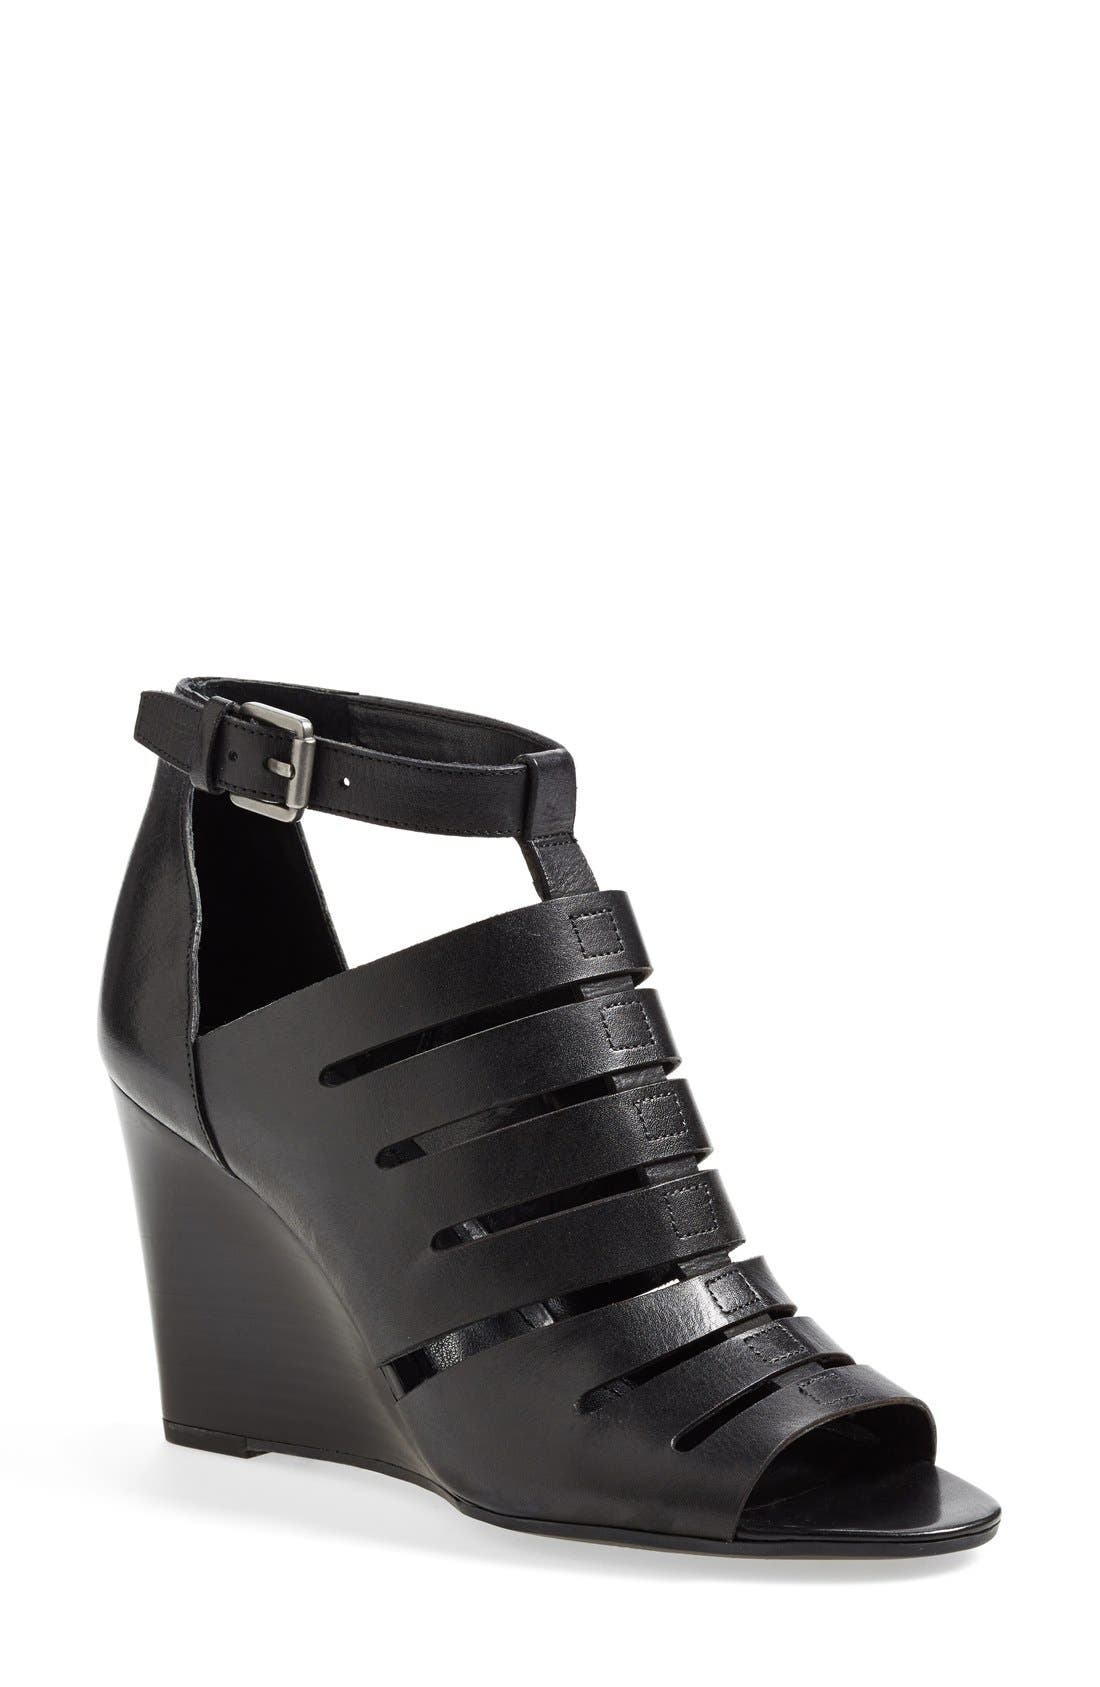 Main Image - Franco Sarto 'Faryn' Wedge Sandal (Online Only) (Women)